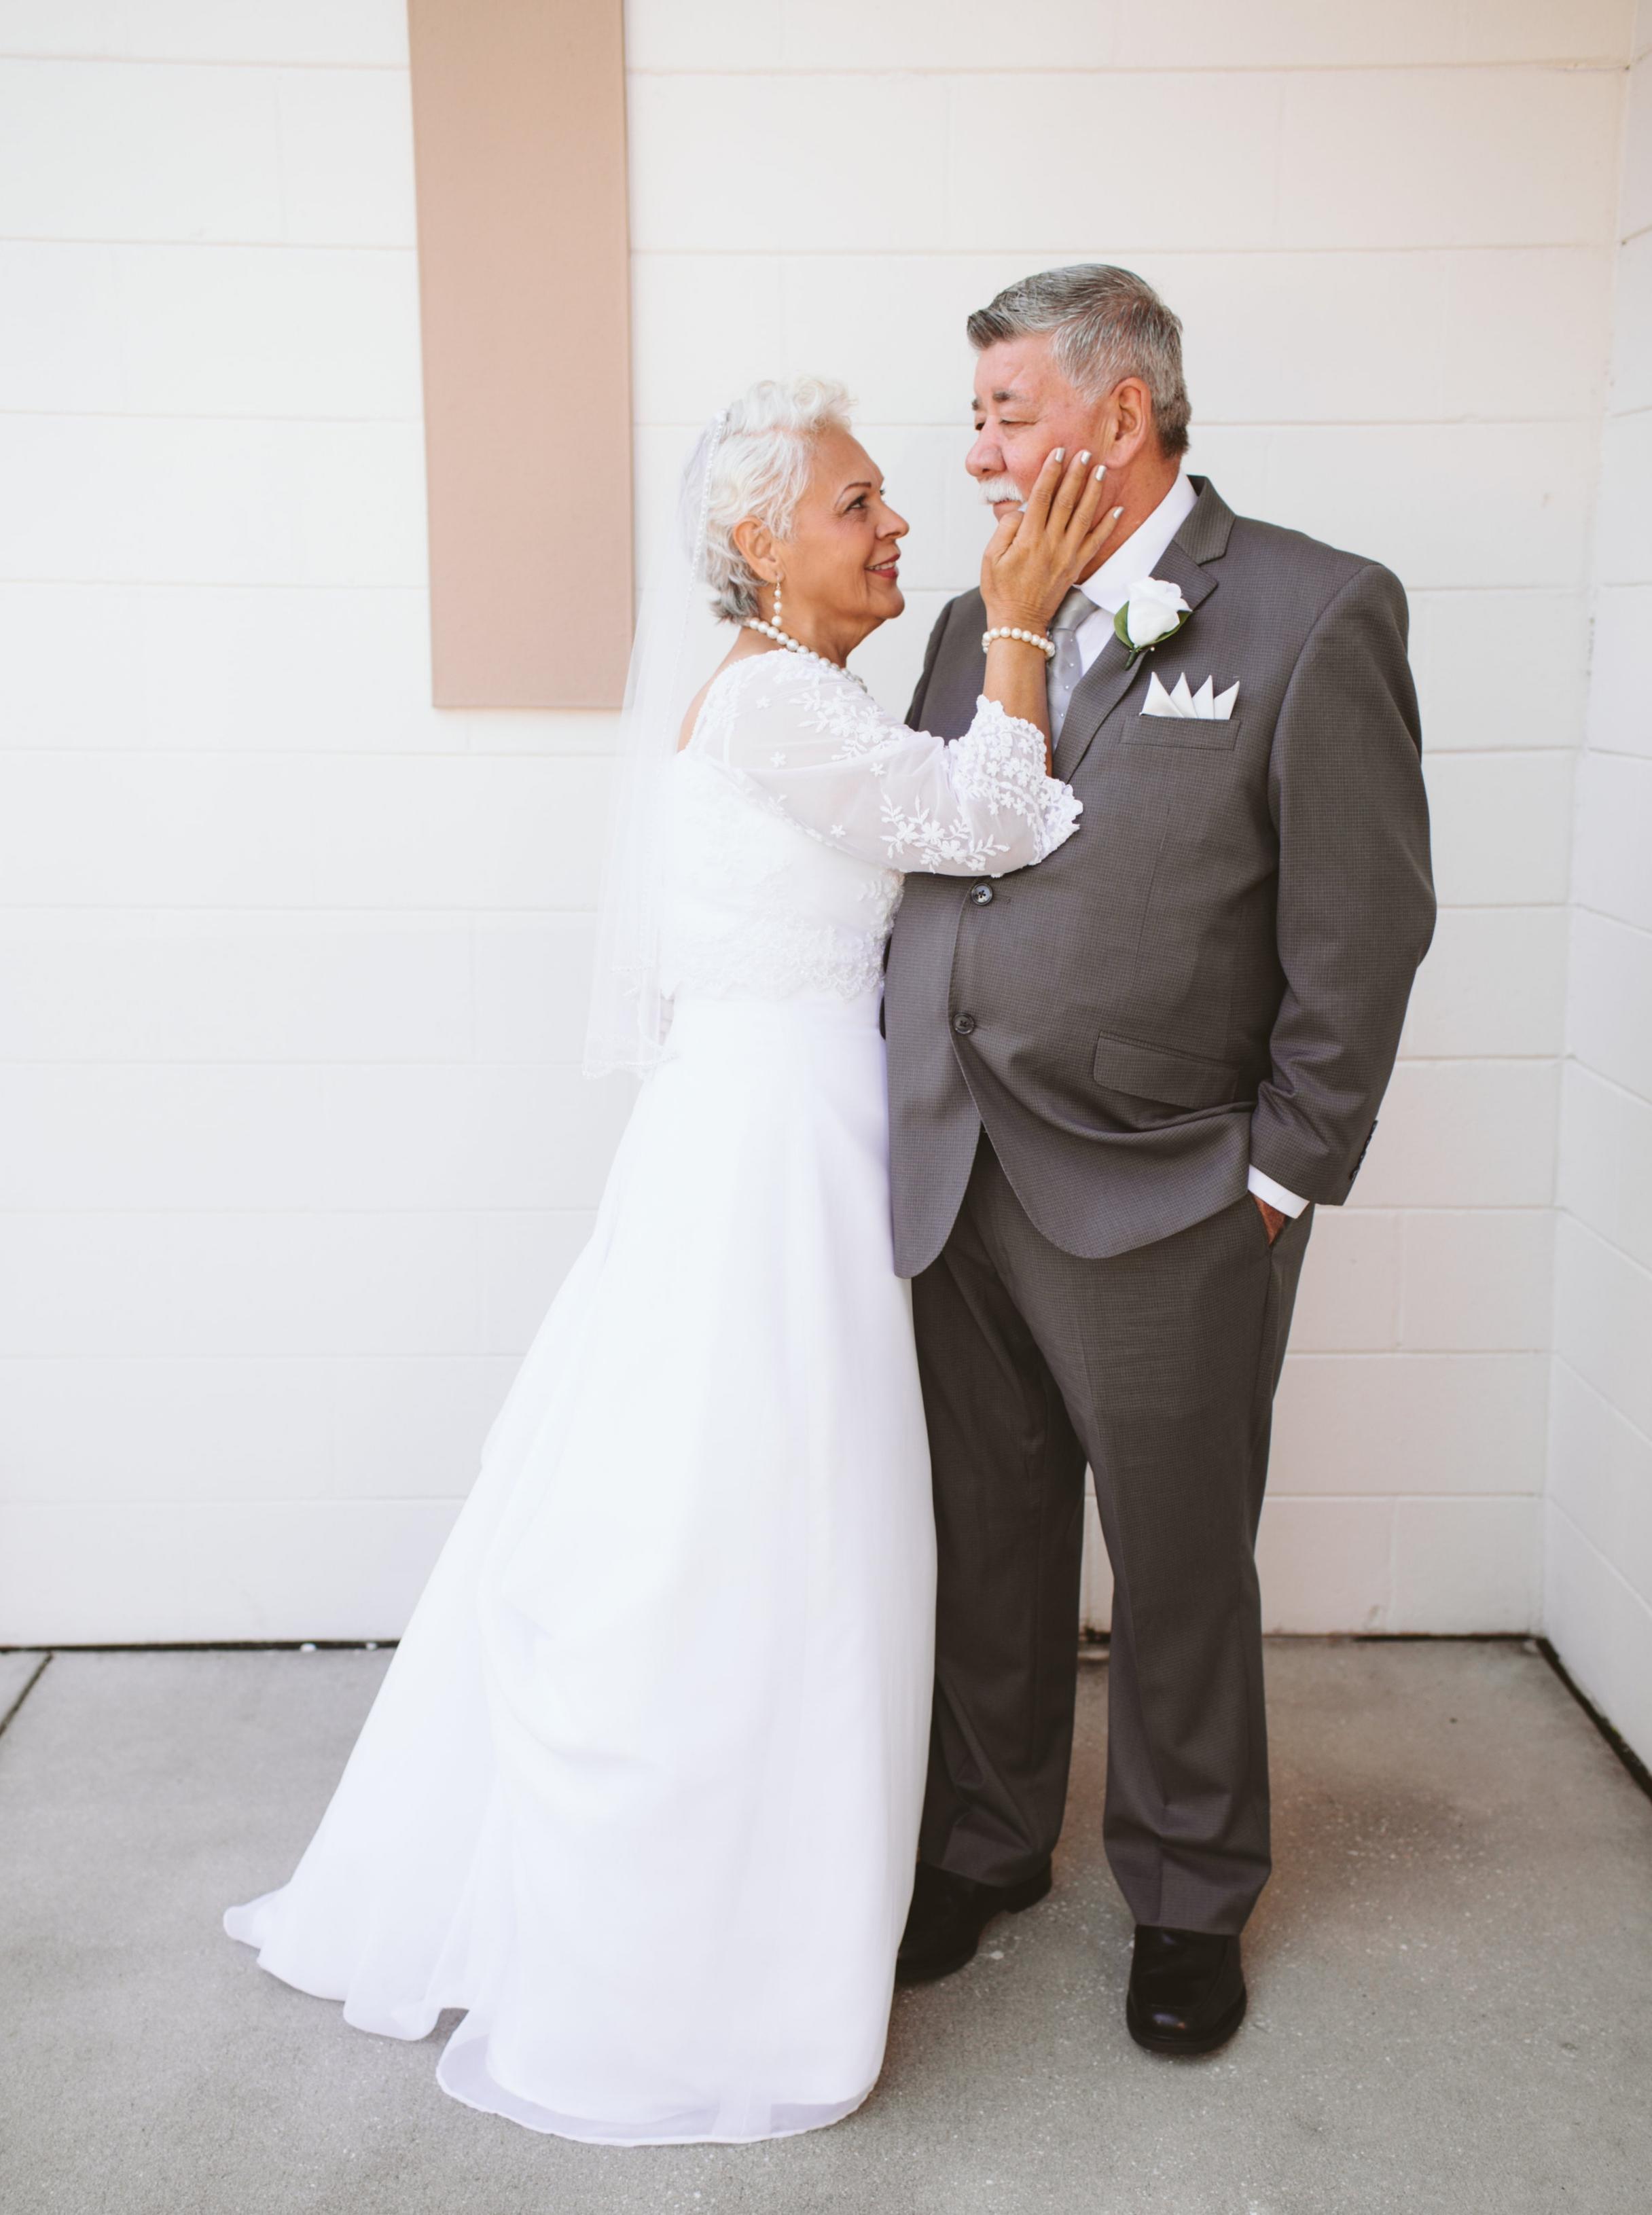 wedding | Vanessa Boy Photography | vanessaboy.com |-67.jpg